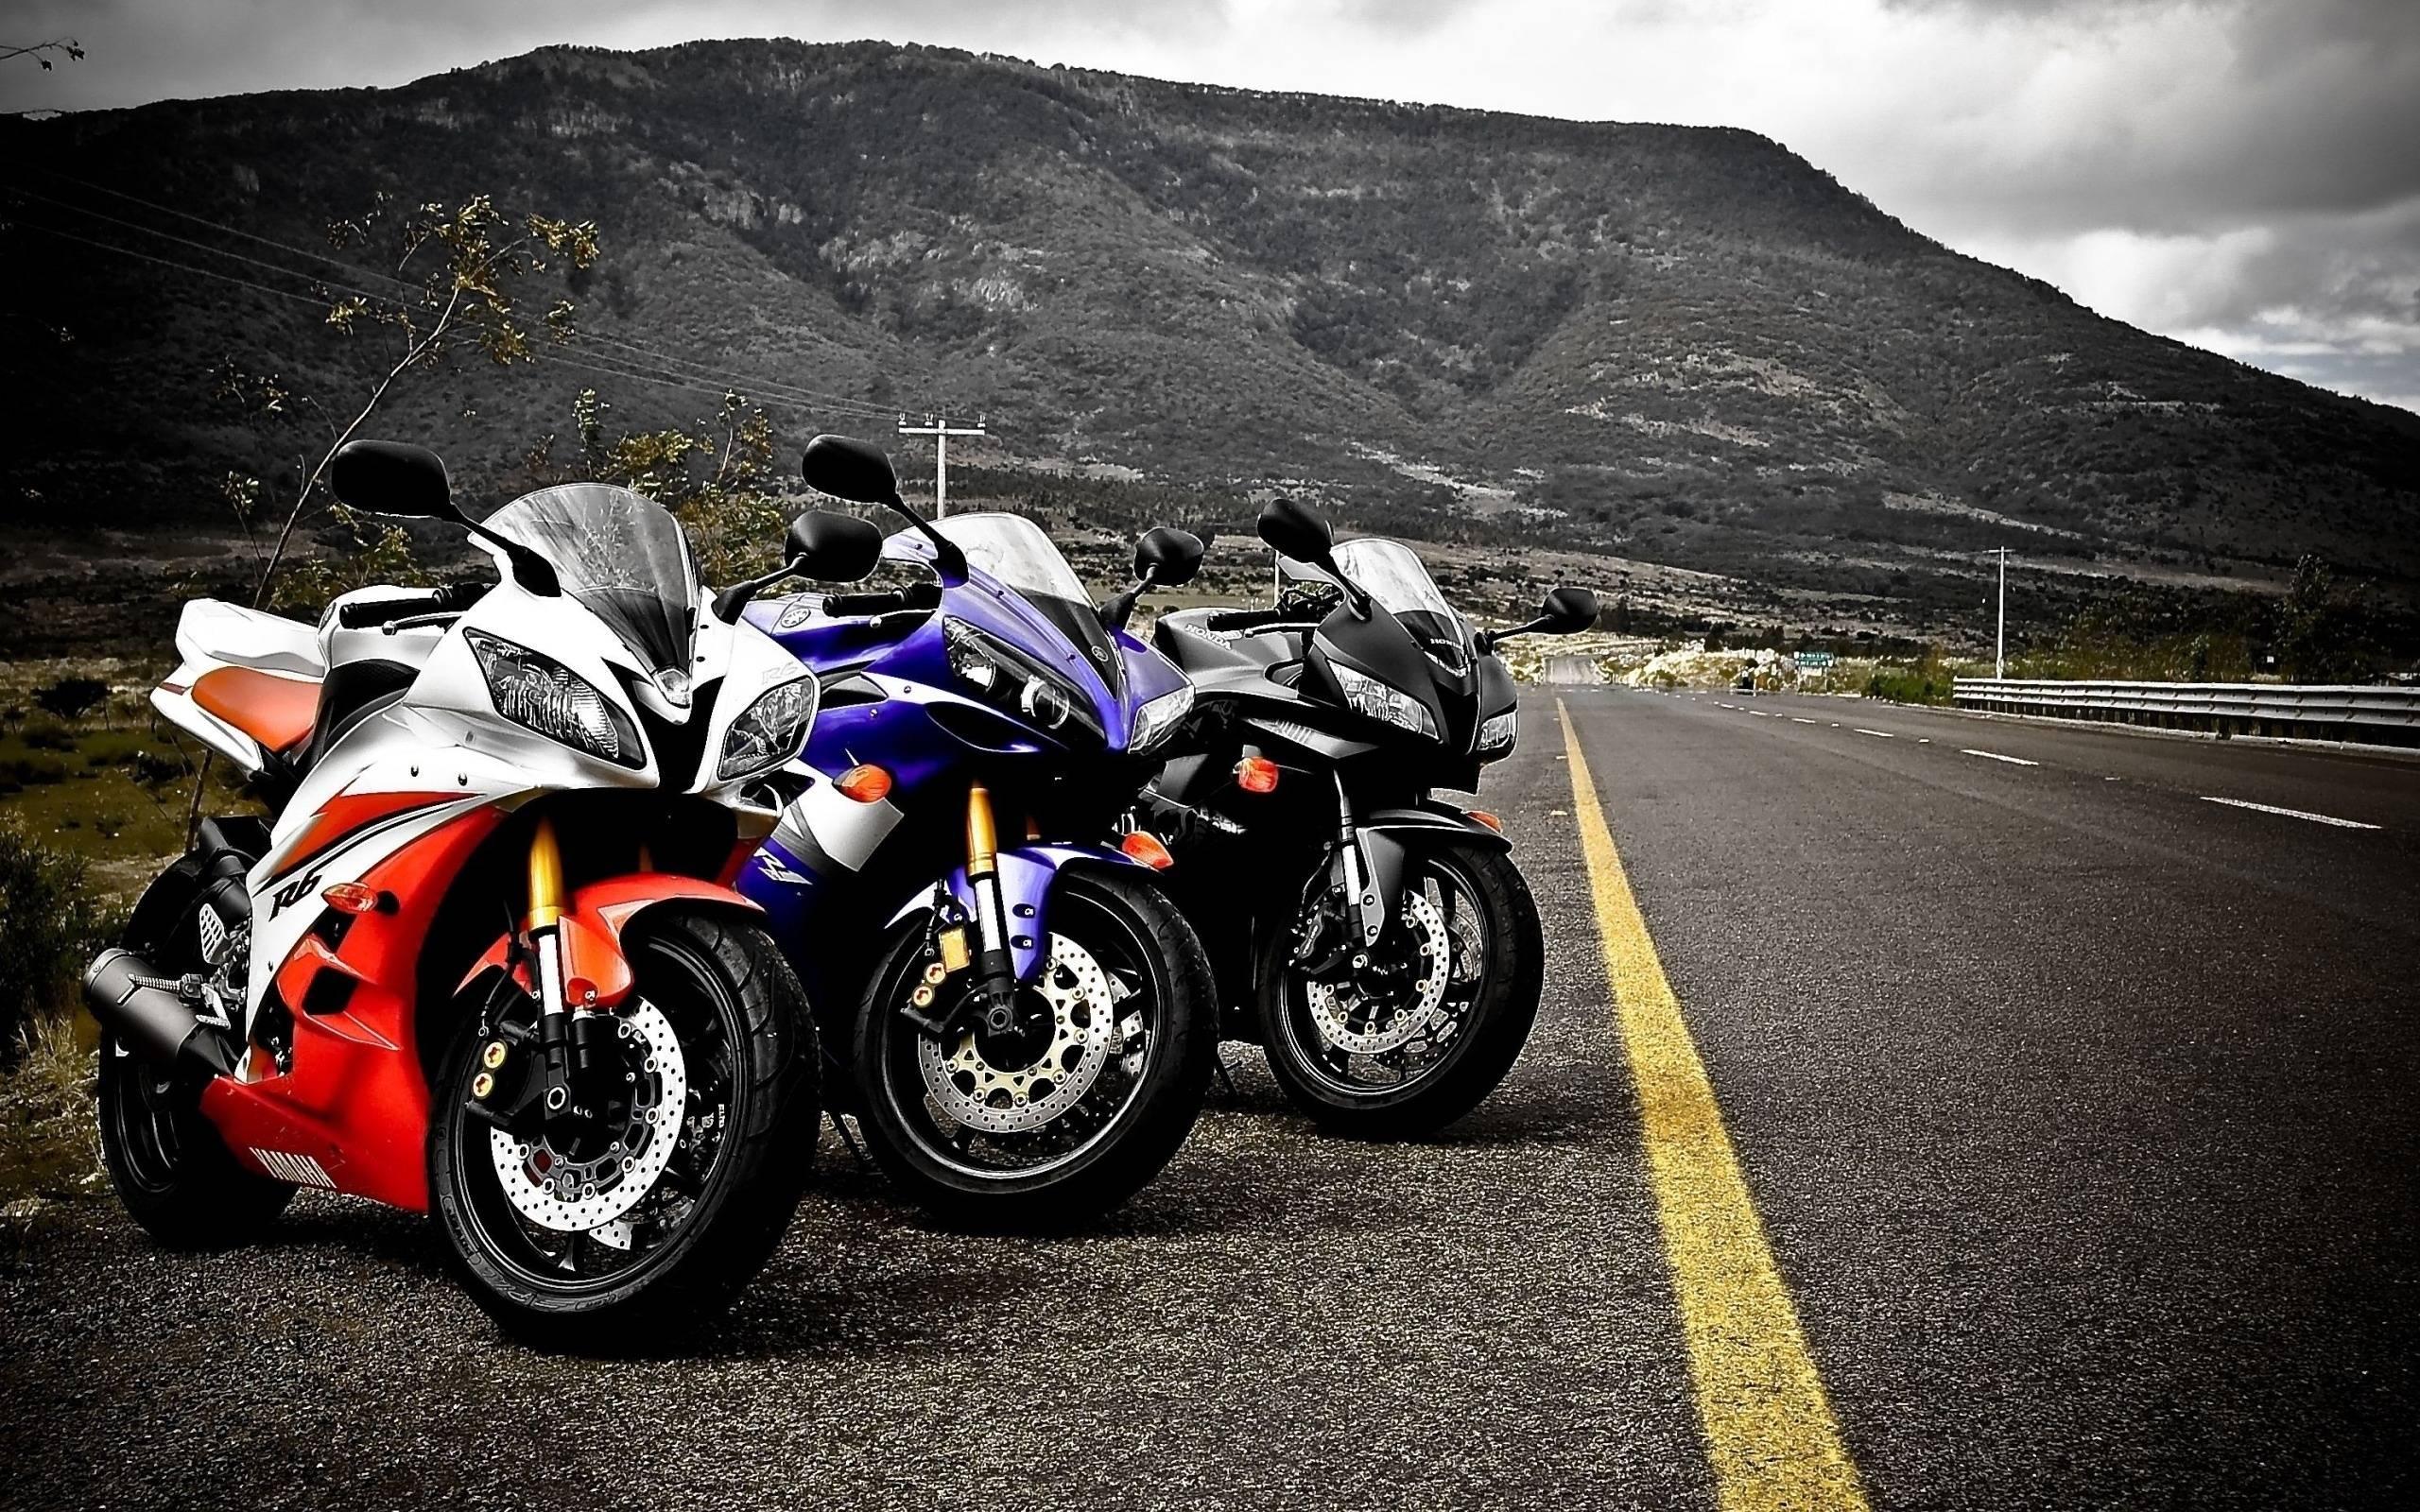 hd motorbike wallpapers top